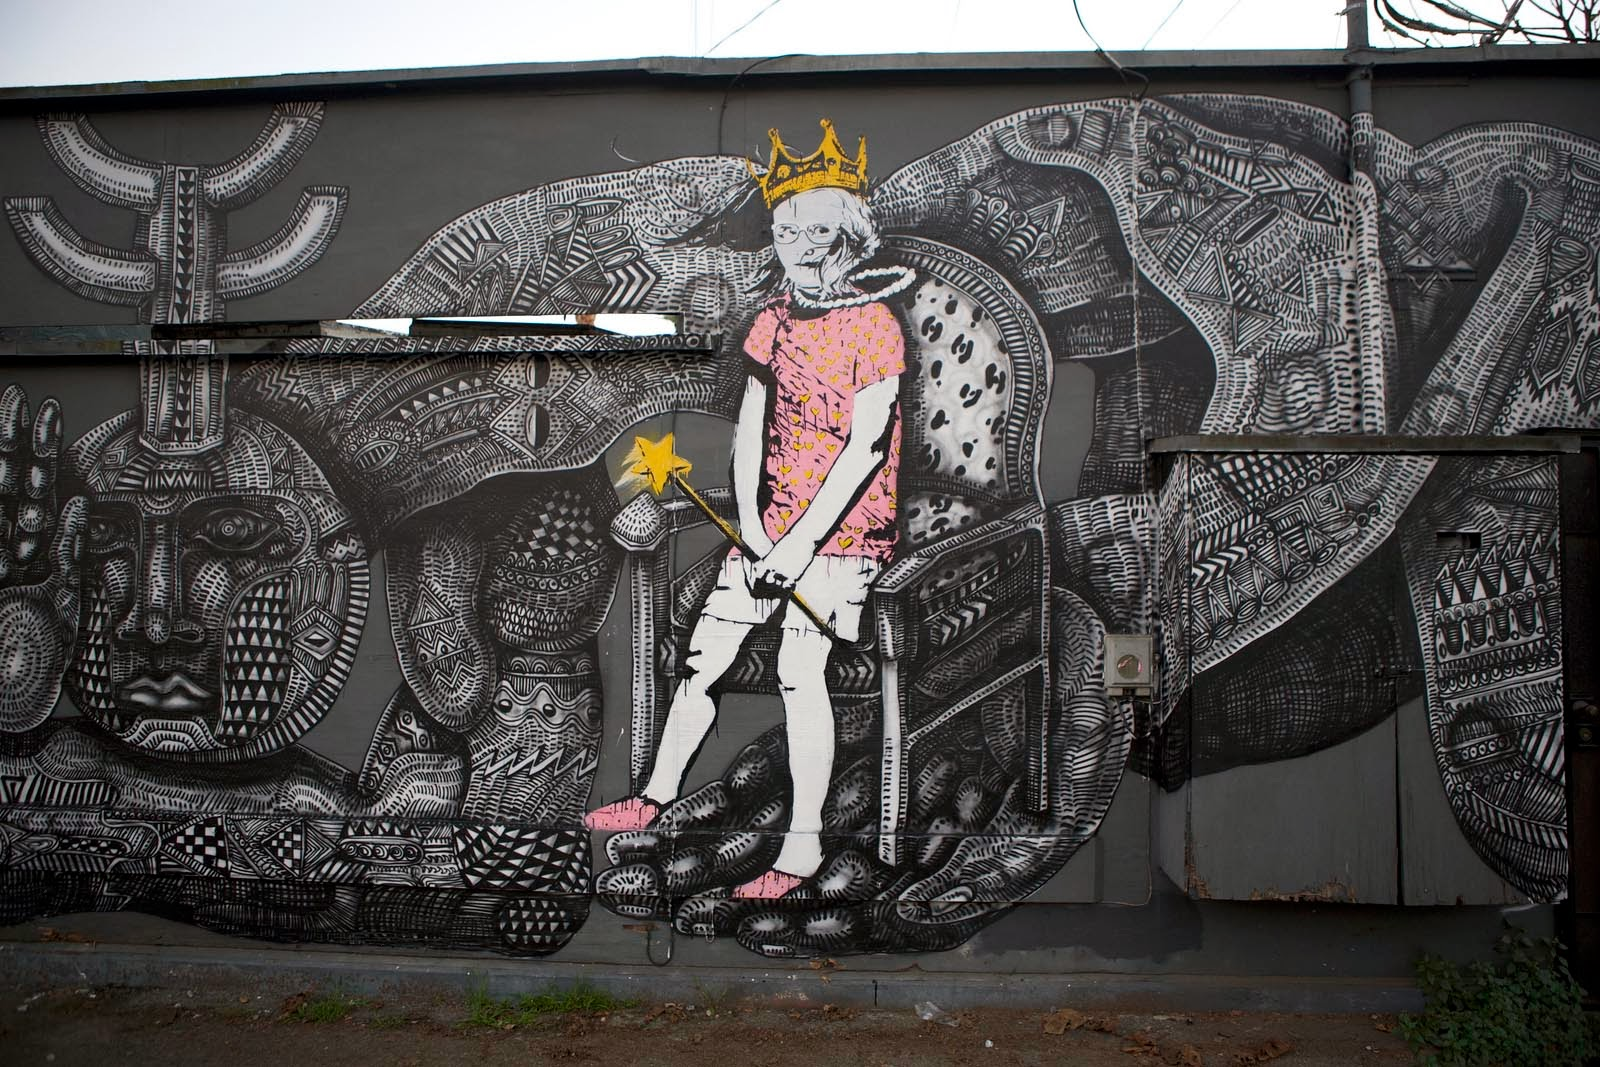 zio-ziegler-bumblebee-new-mural-in-venice-california-06